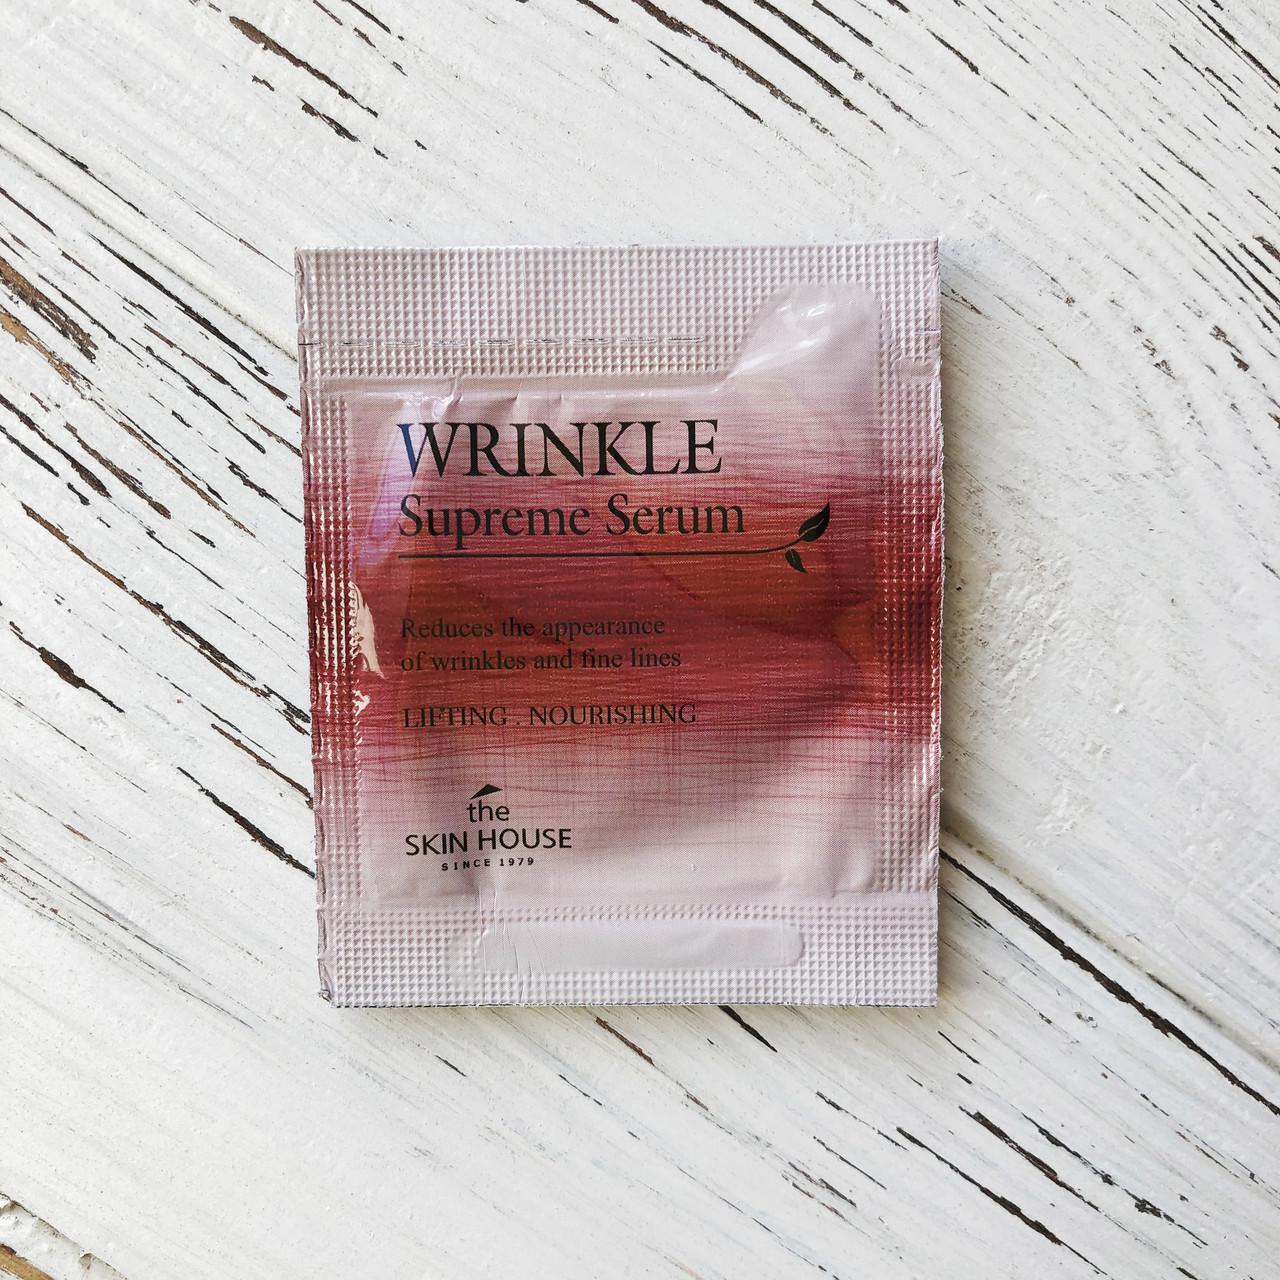 Пробник Питательная сыворотка с женьшенем The Skin House Wrinkle Supreme Serum, 2 мл